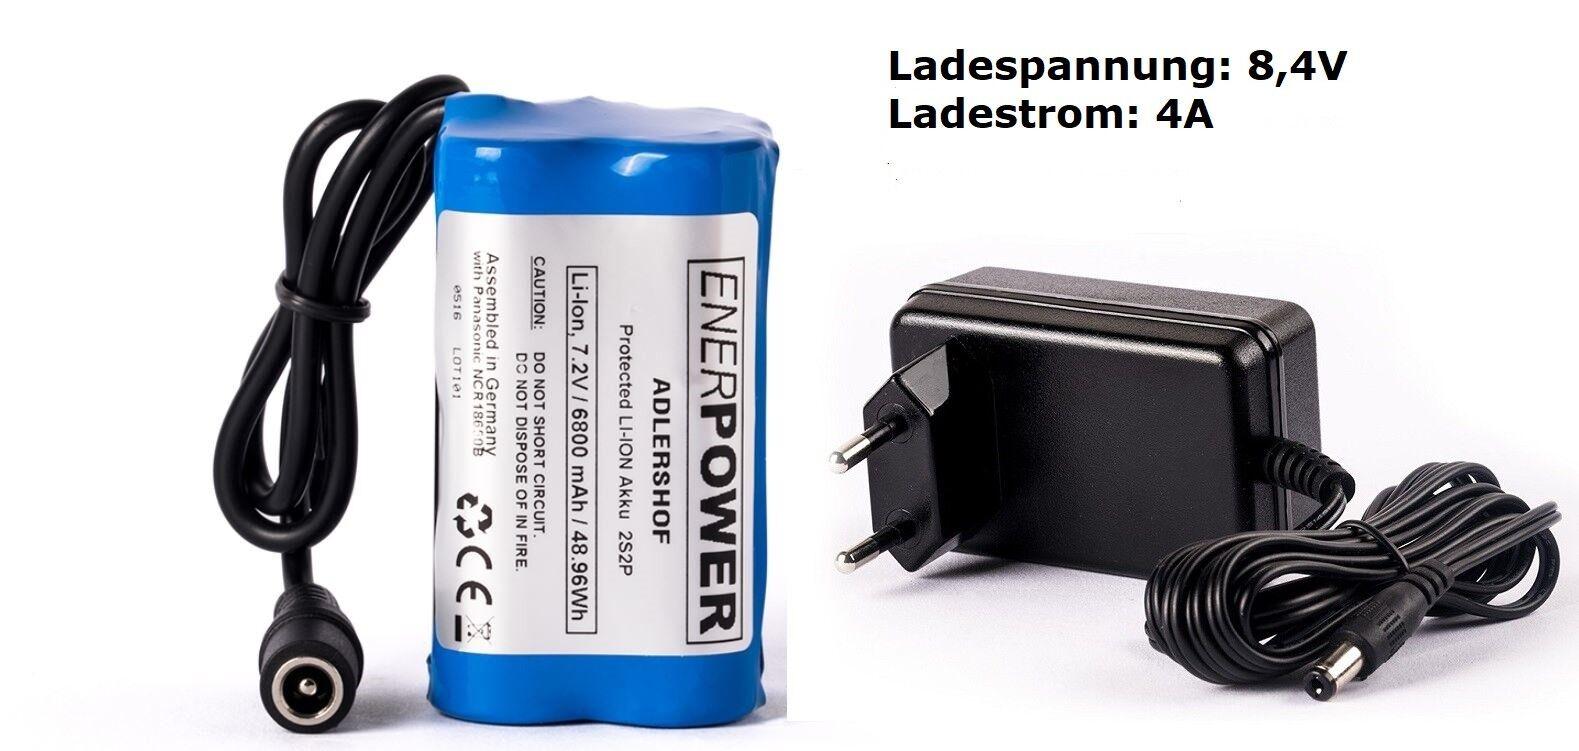 ENERpower Adlershof Akku 7,2V-7,4V Li-Ion 6800 mAh DC LED Lampe + Ladegerät 4A